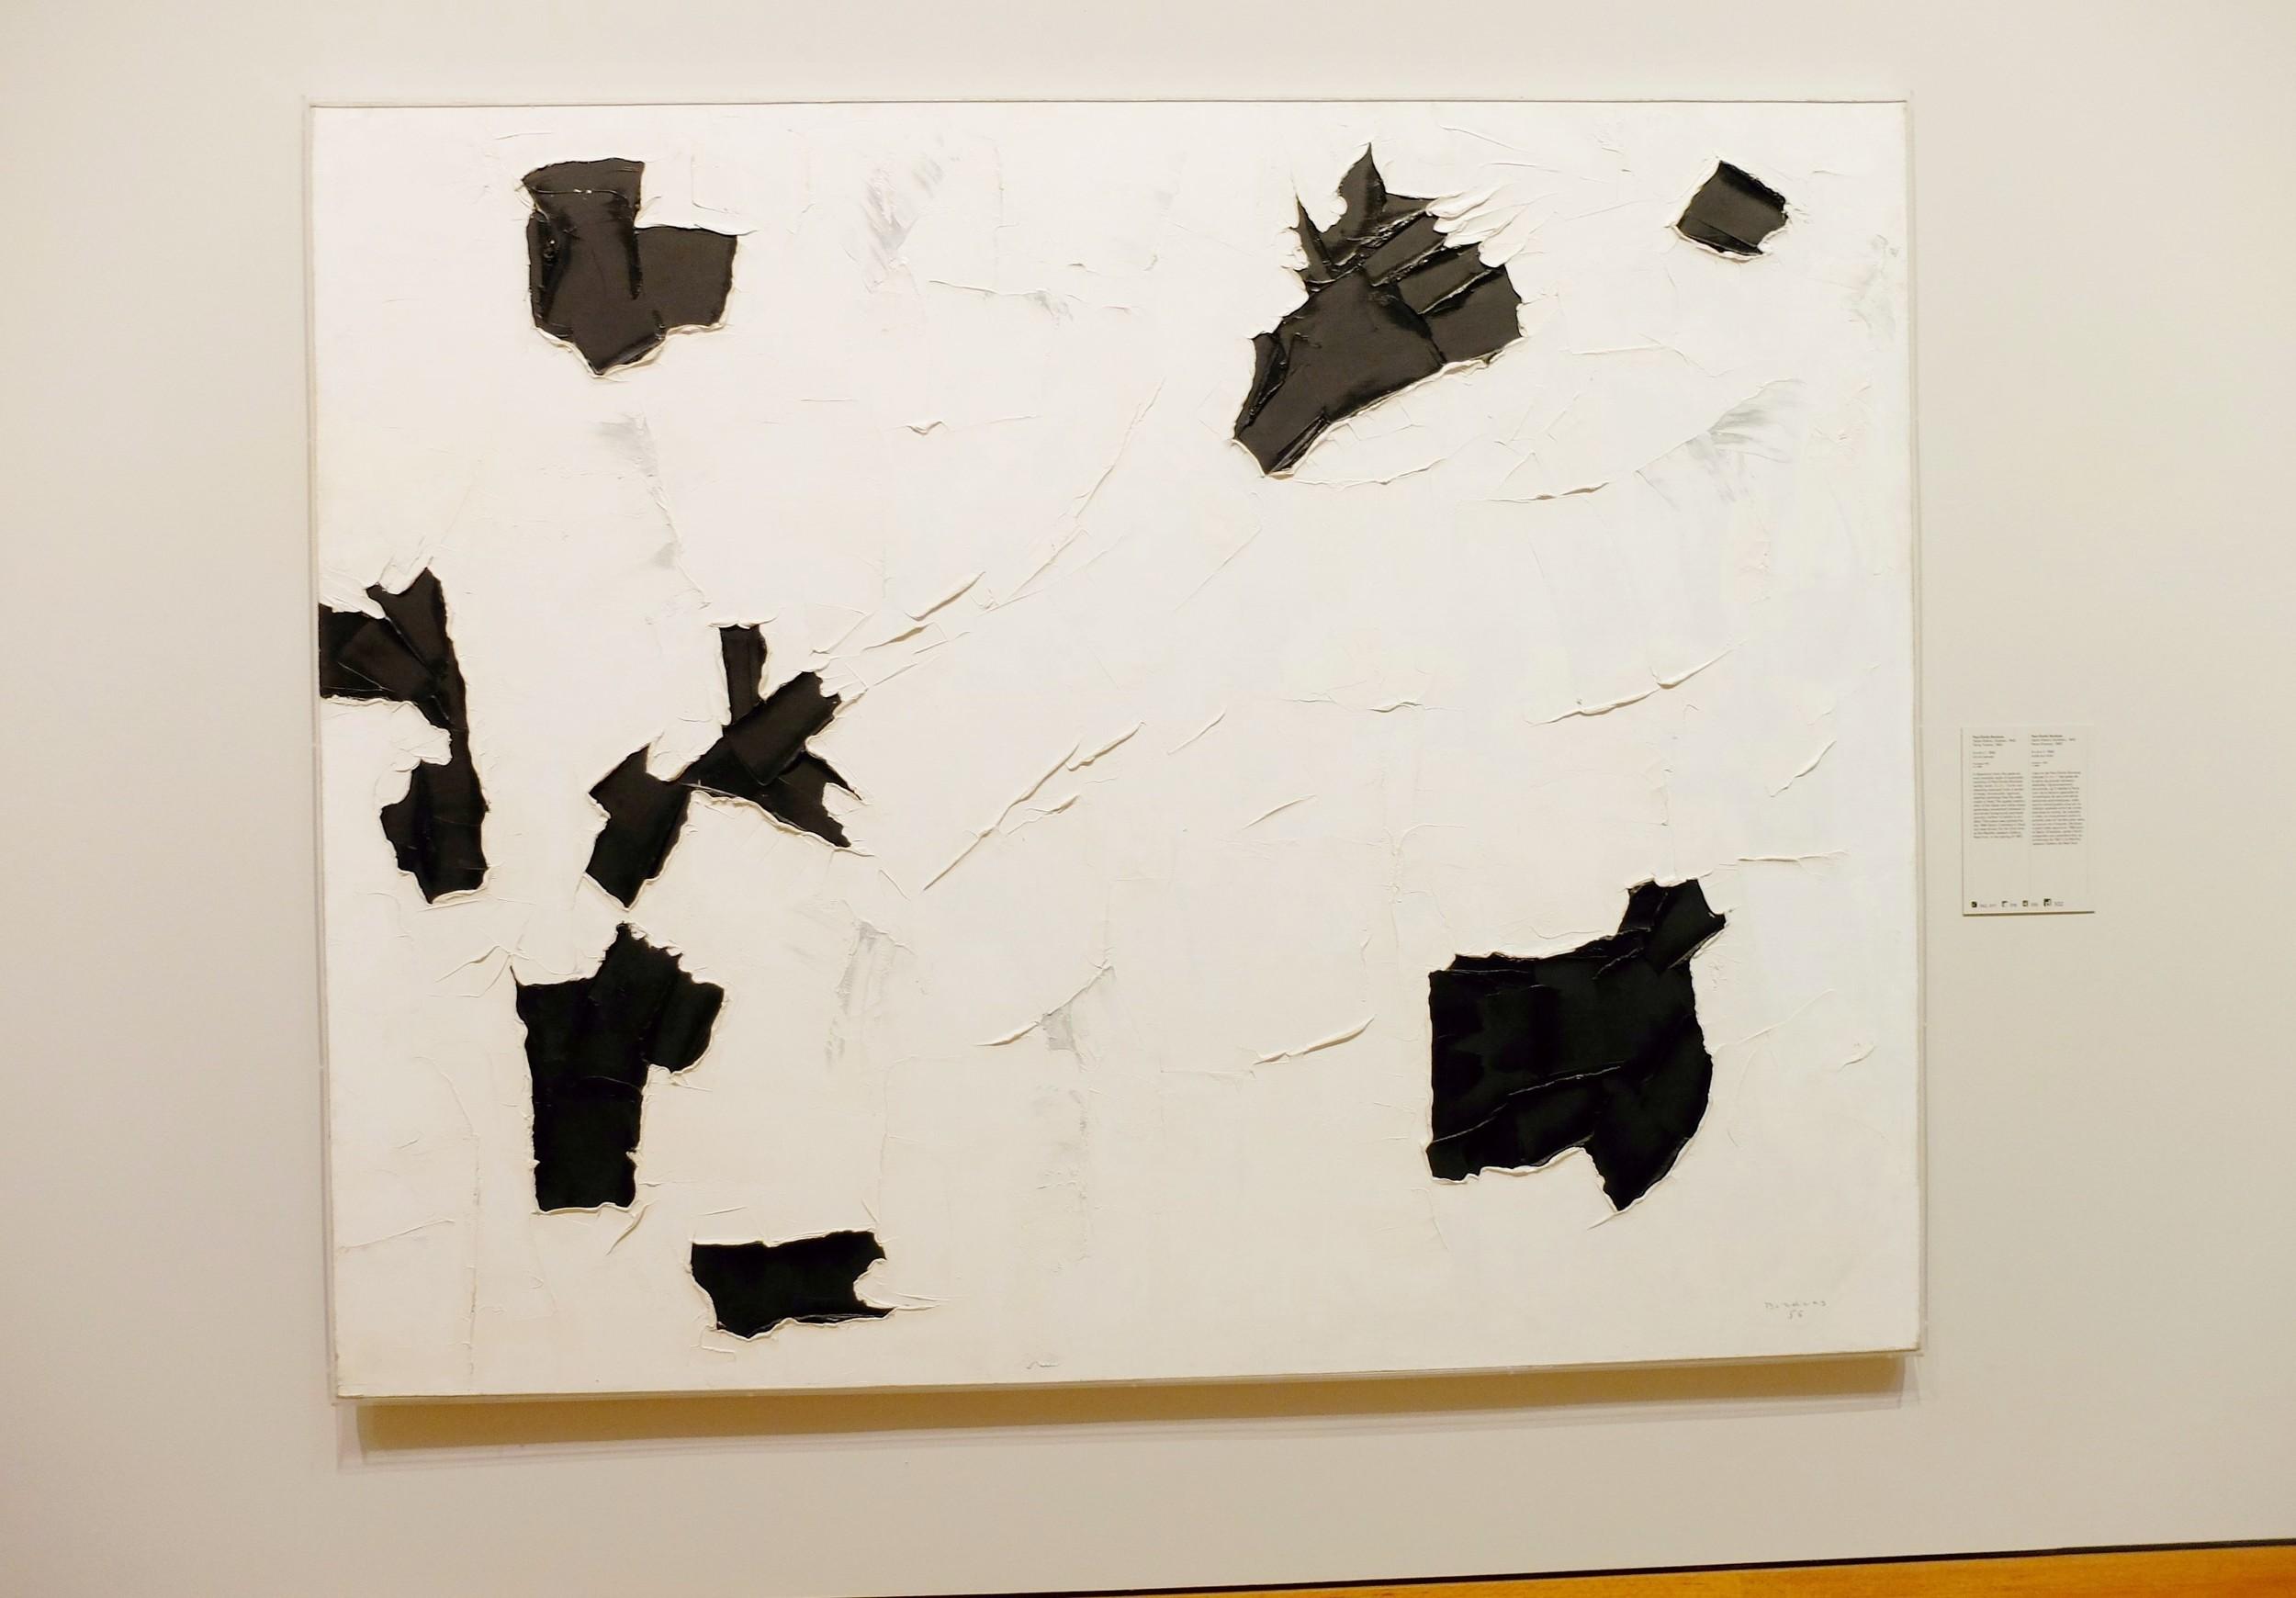 Paul-Émile Borduas, 3+4+1 , 1956, oil on canvas, 199.8 x 250 cm, National Gallery of Canada, Ottawa